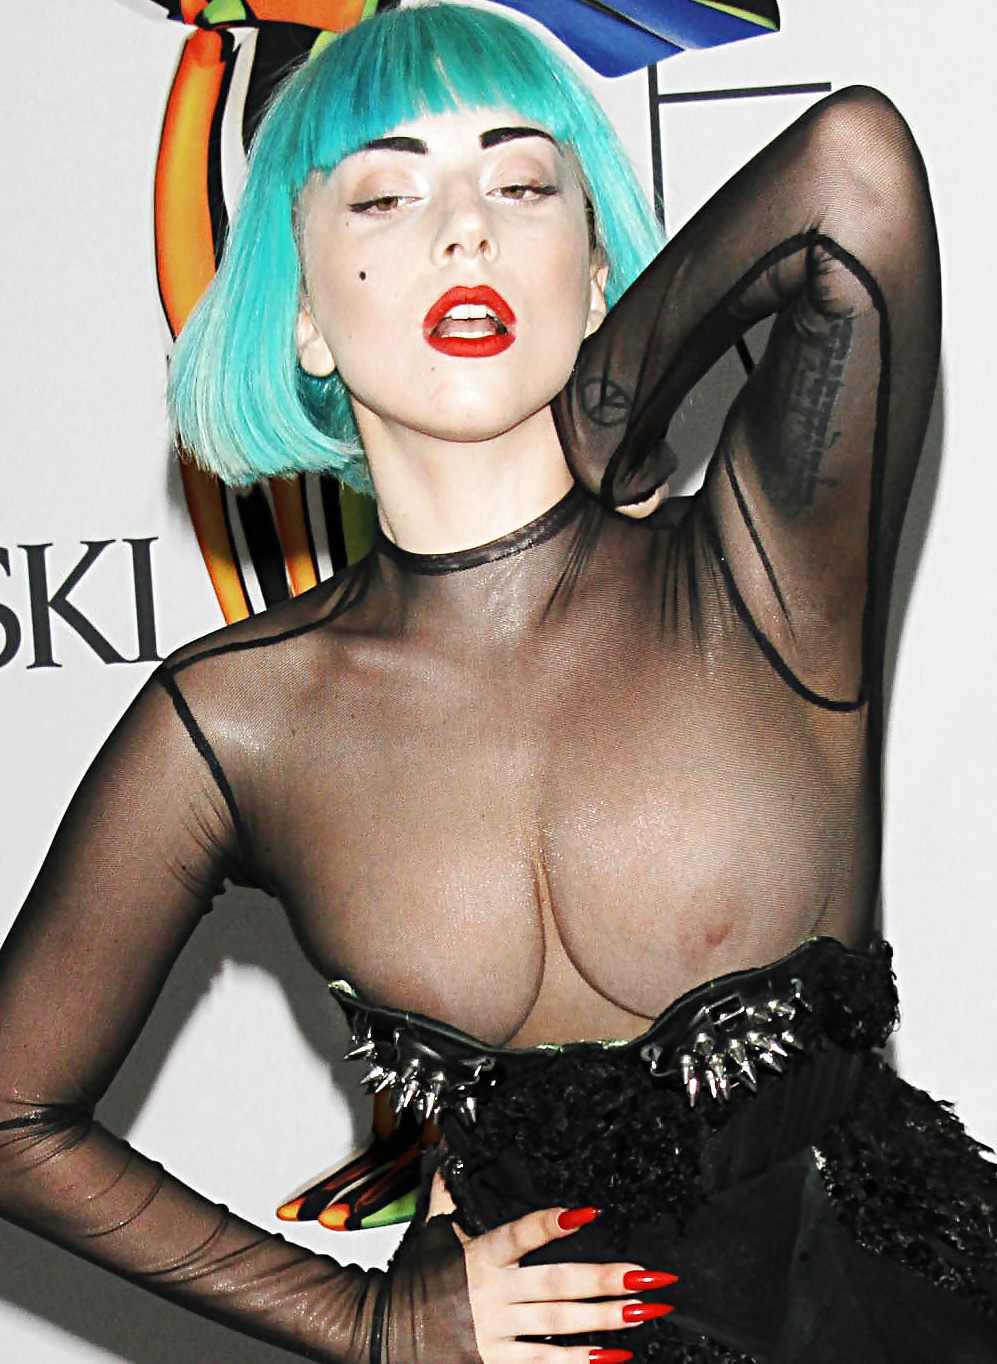 Porno tantra lady gaga free nude pics hillary scott